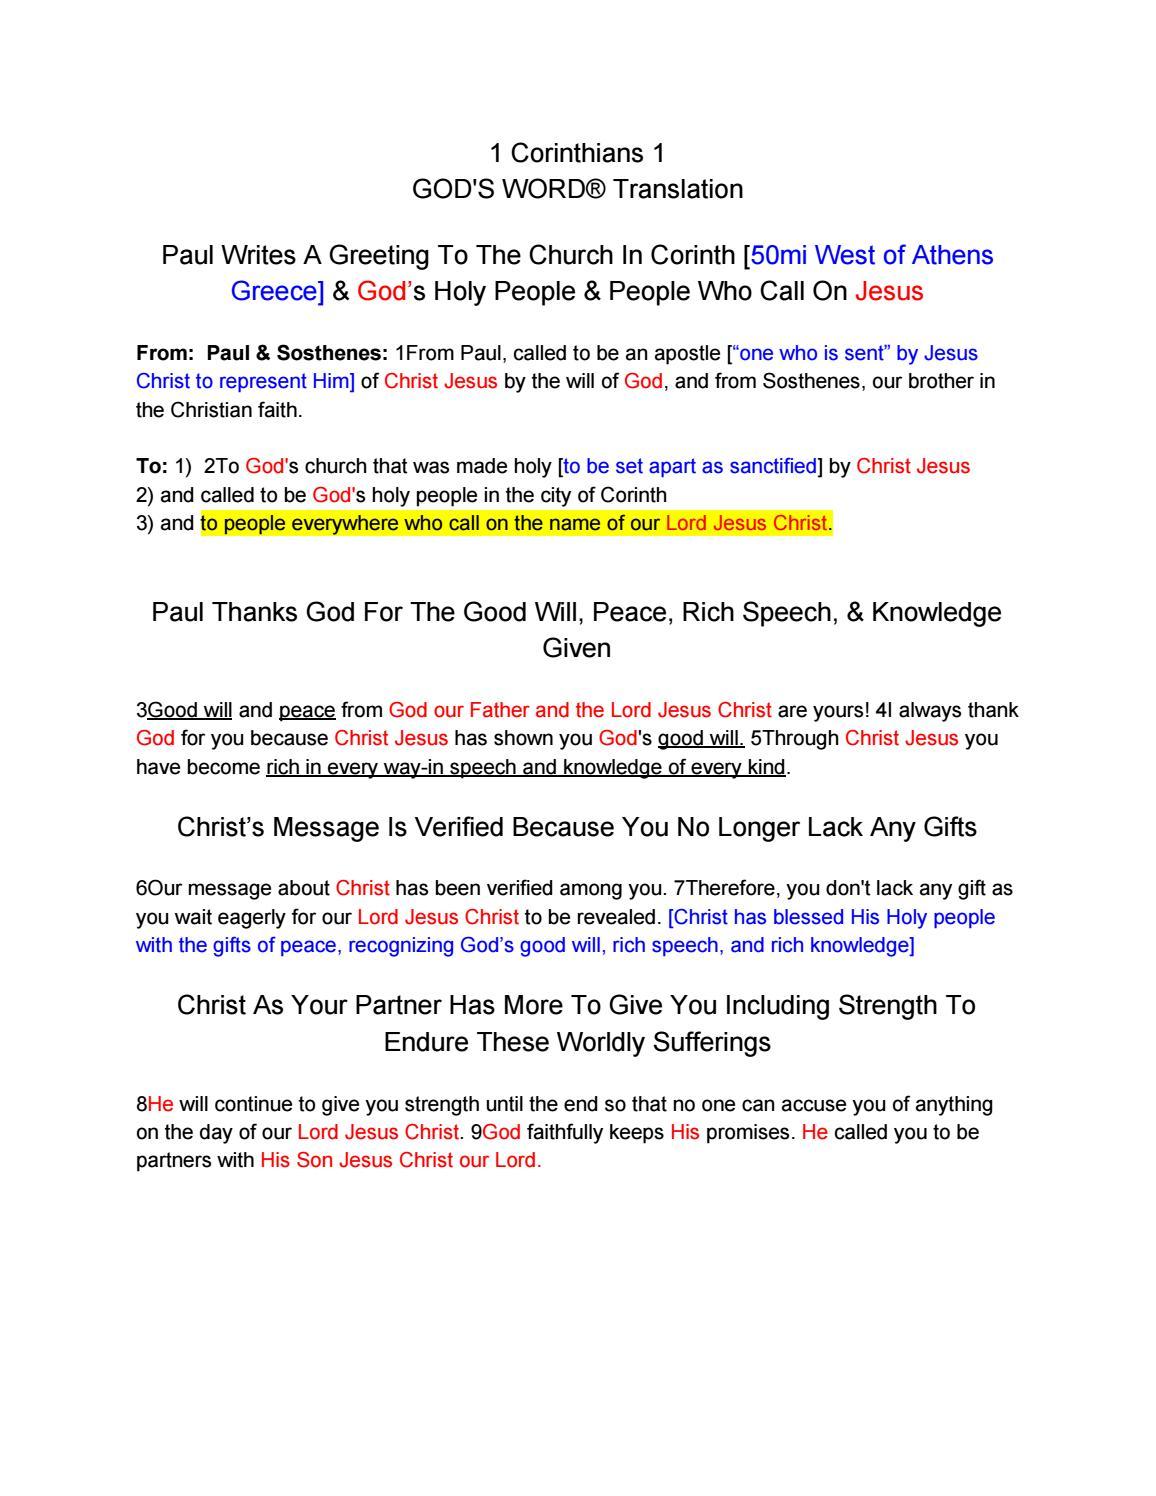 1 corinthians 1 by 2nd corinthians 4th chapter issuu m4hsunfo